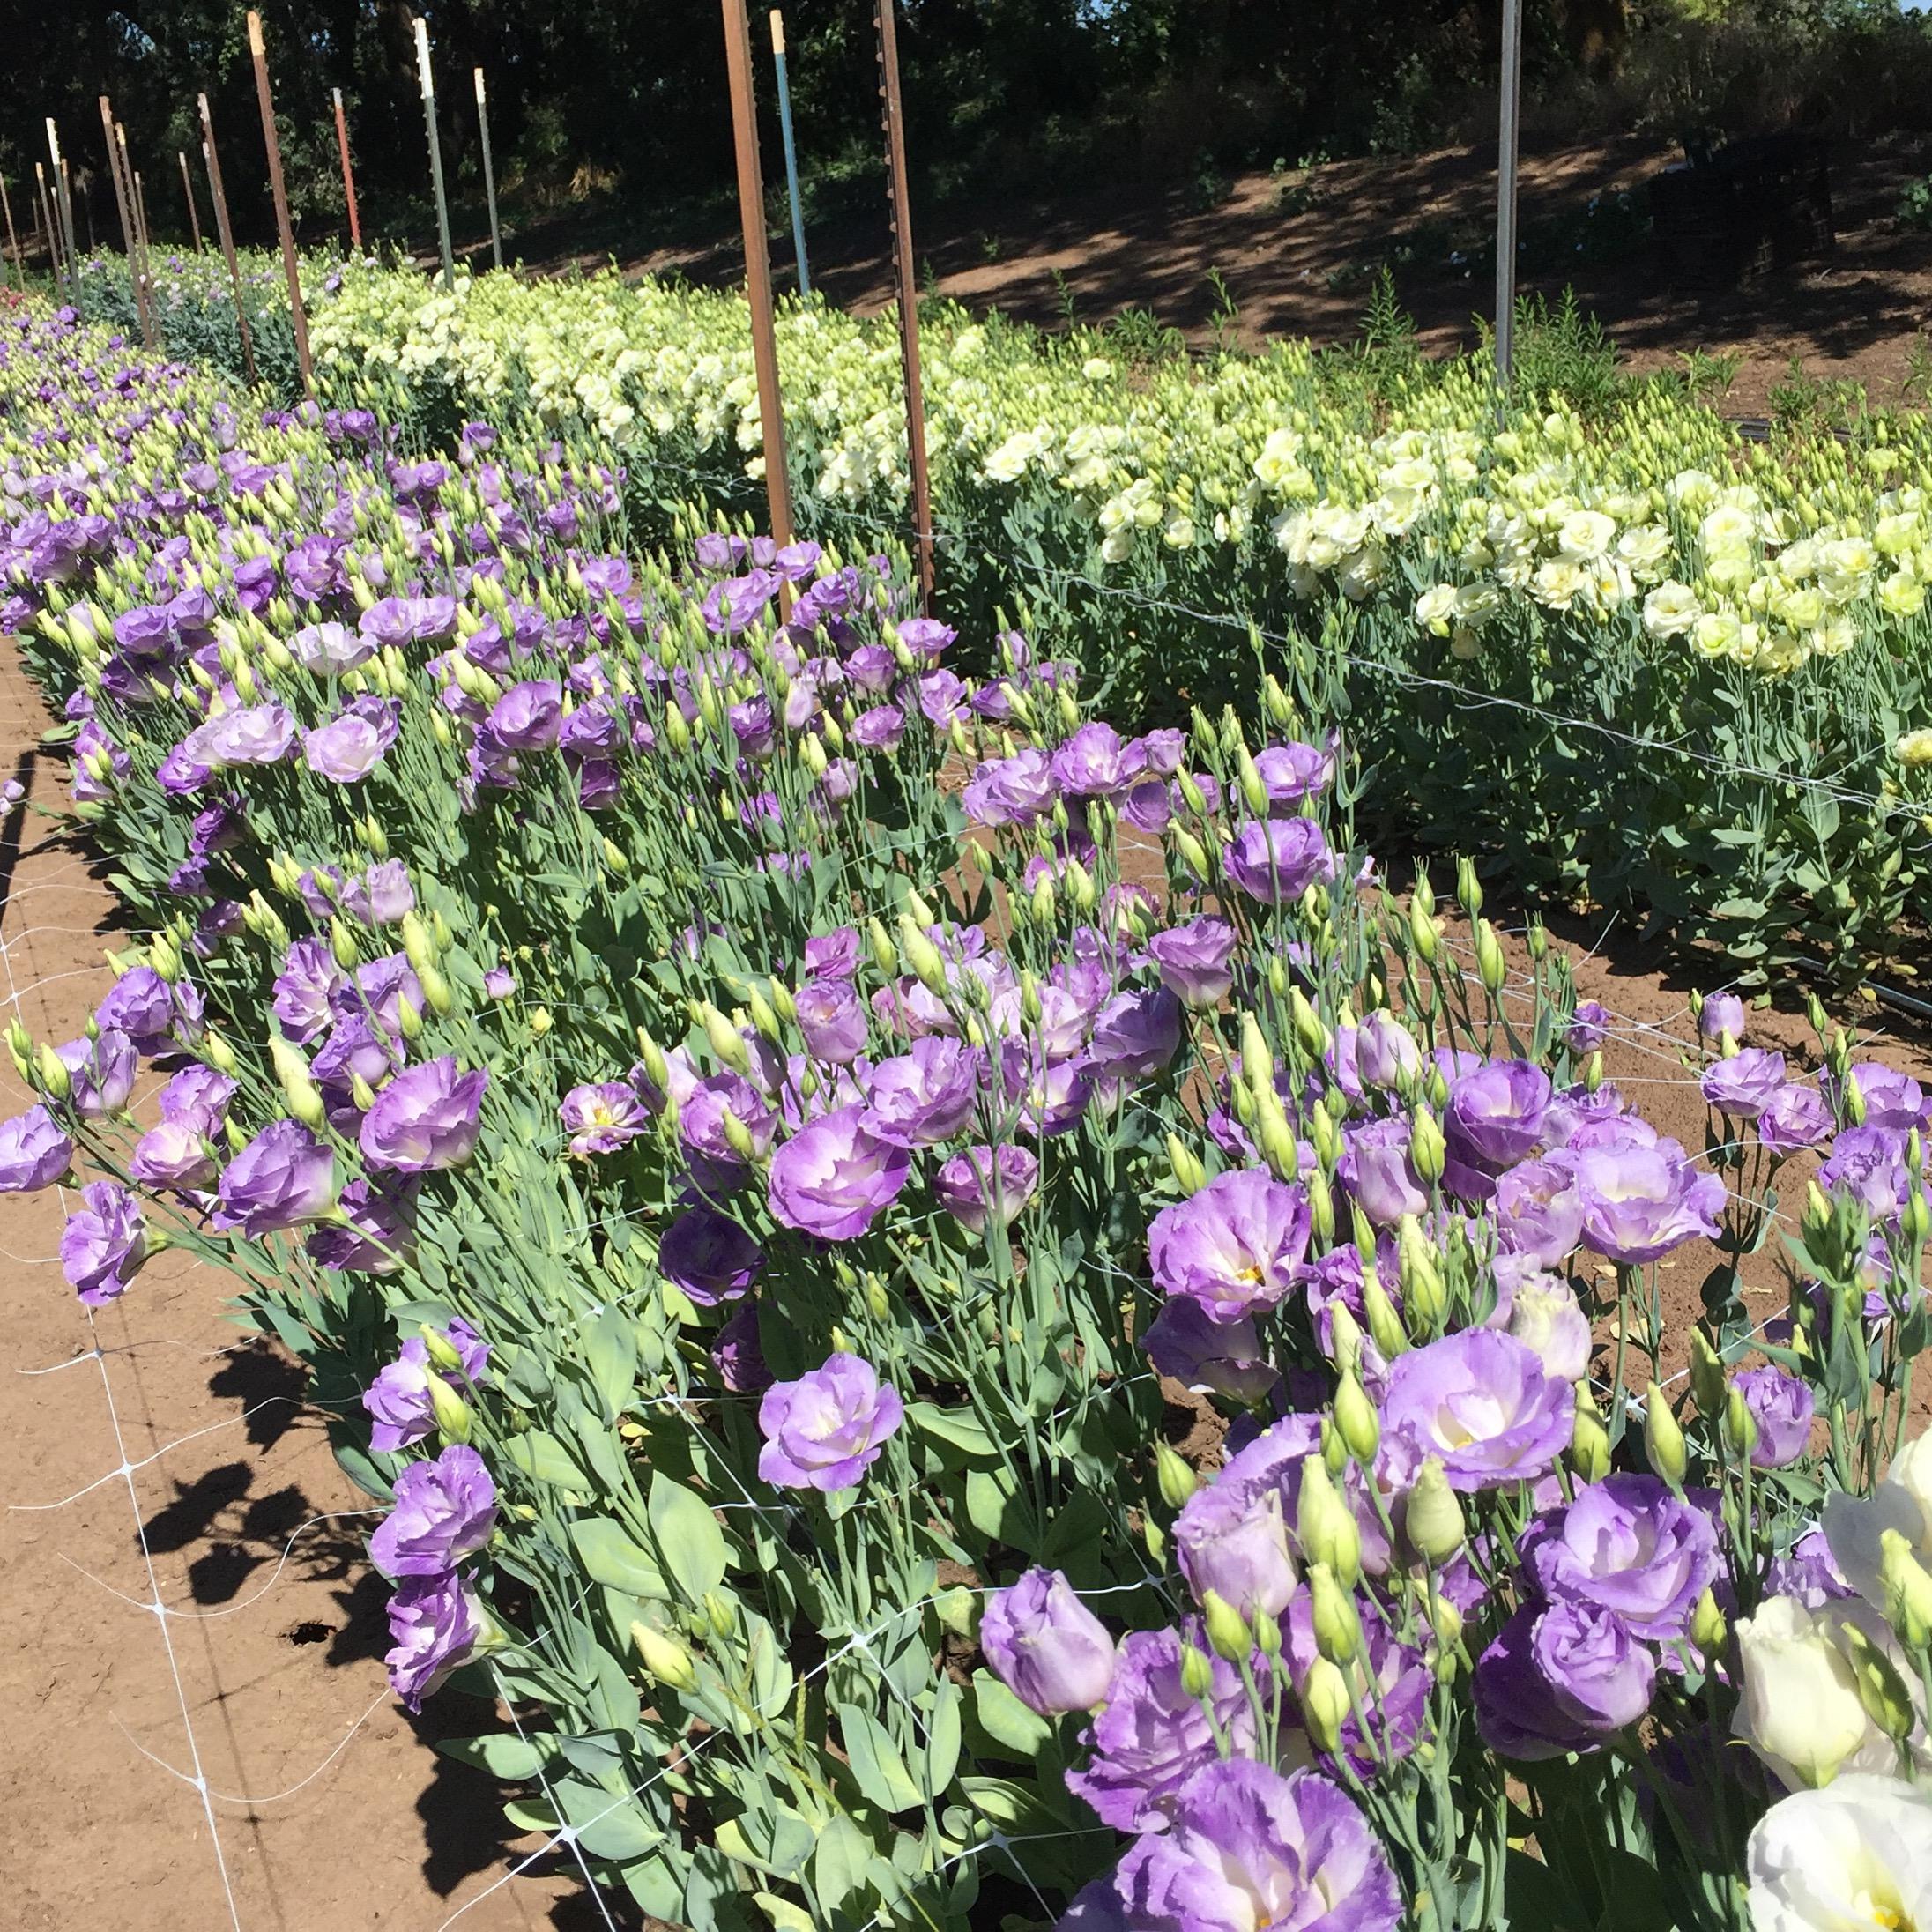 lisianthus in full bloom